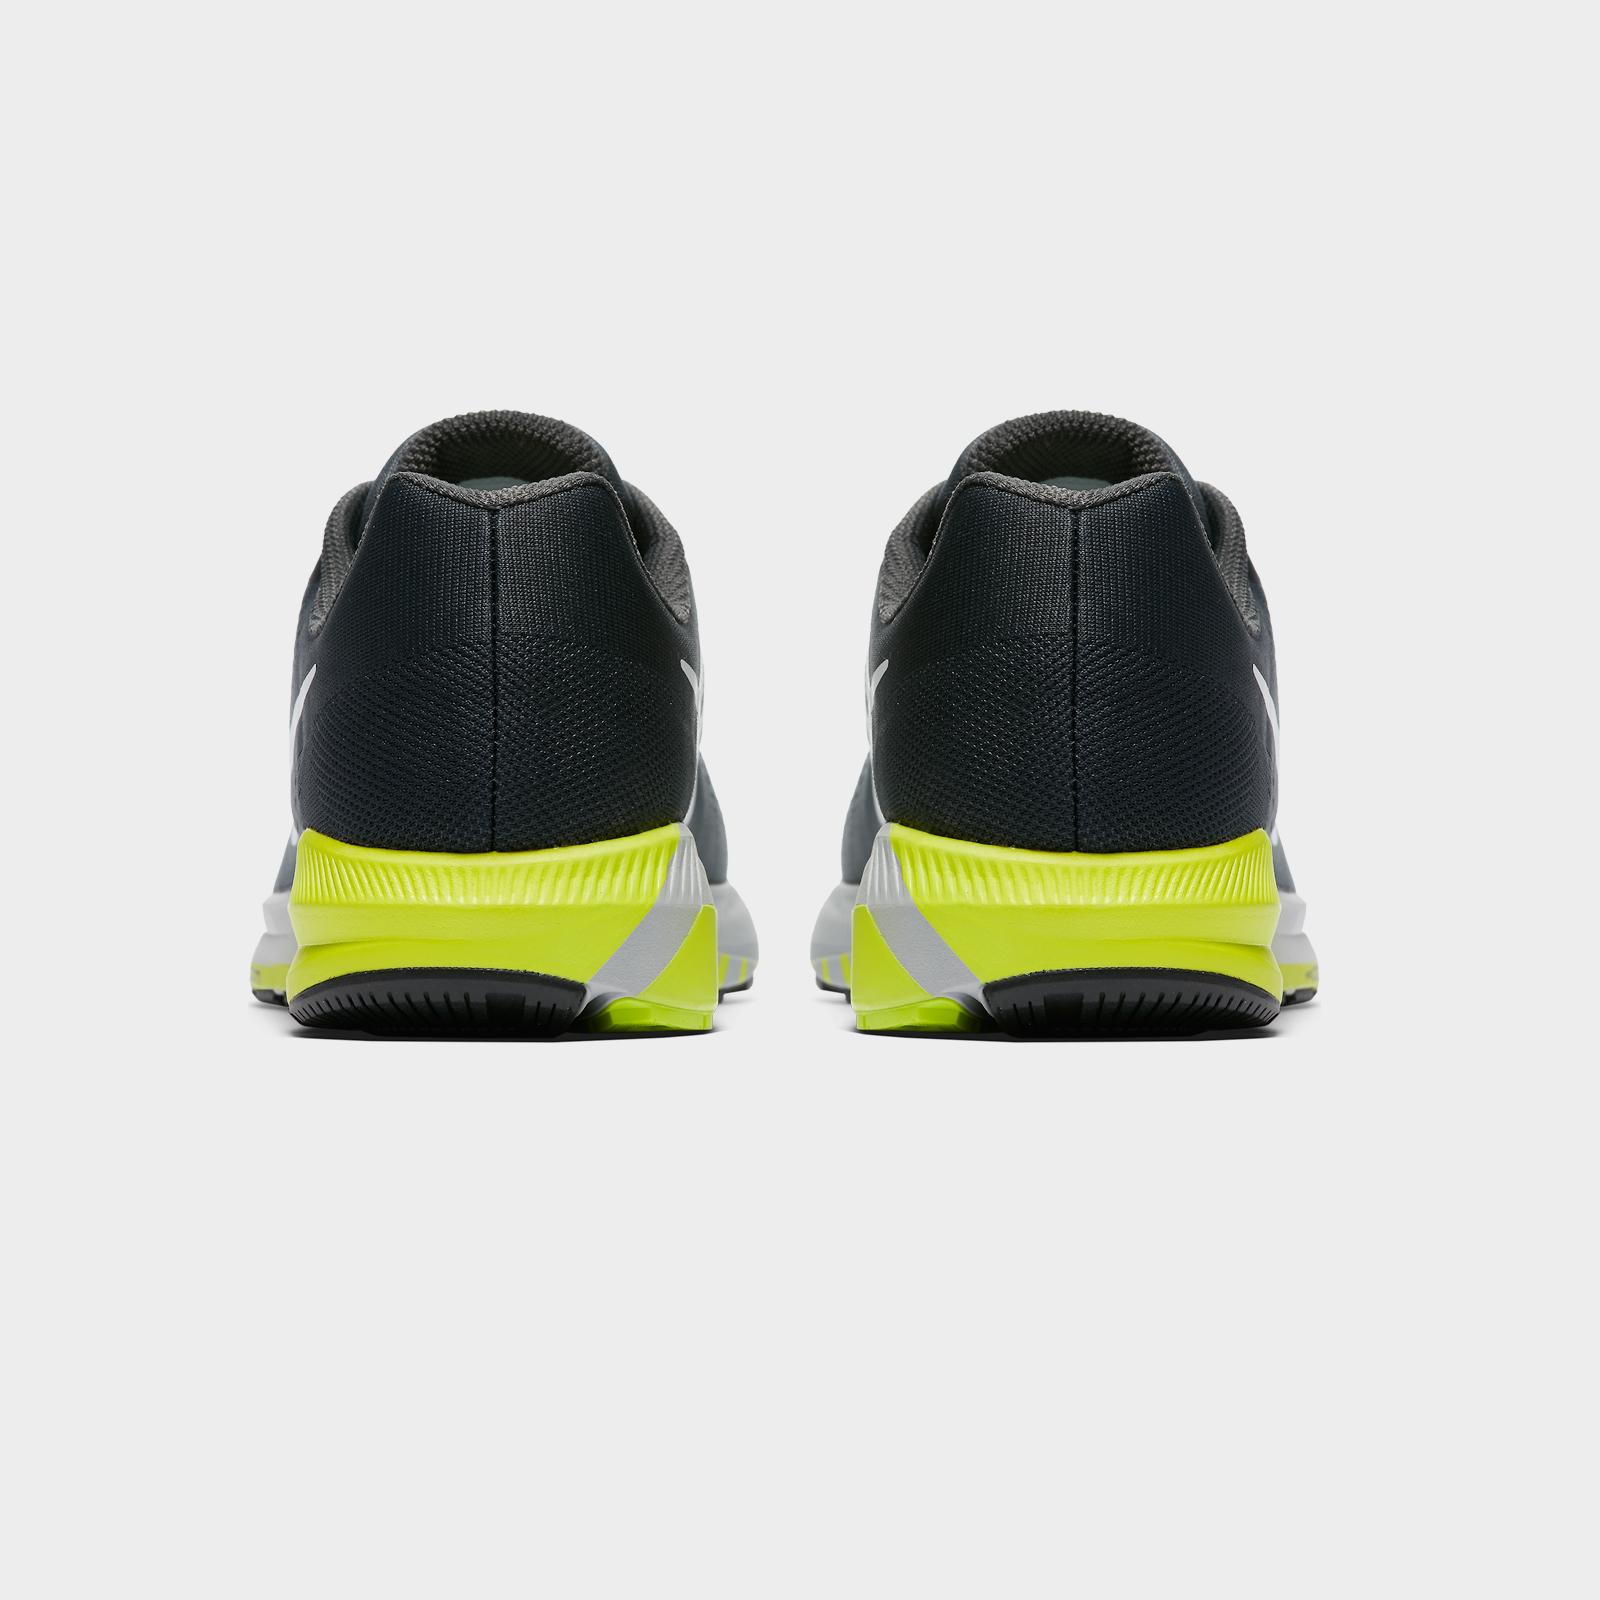 11548443406 Nike Air Zoom Structure 21 - 904695-007 - Sneakersnstuff